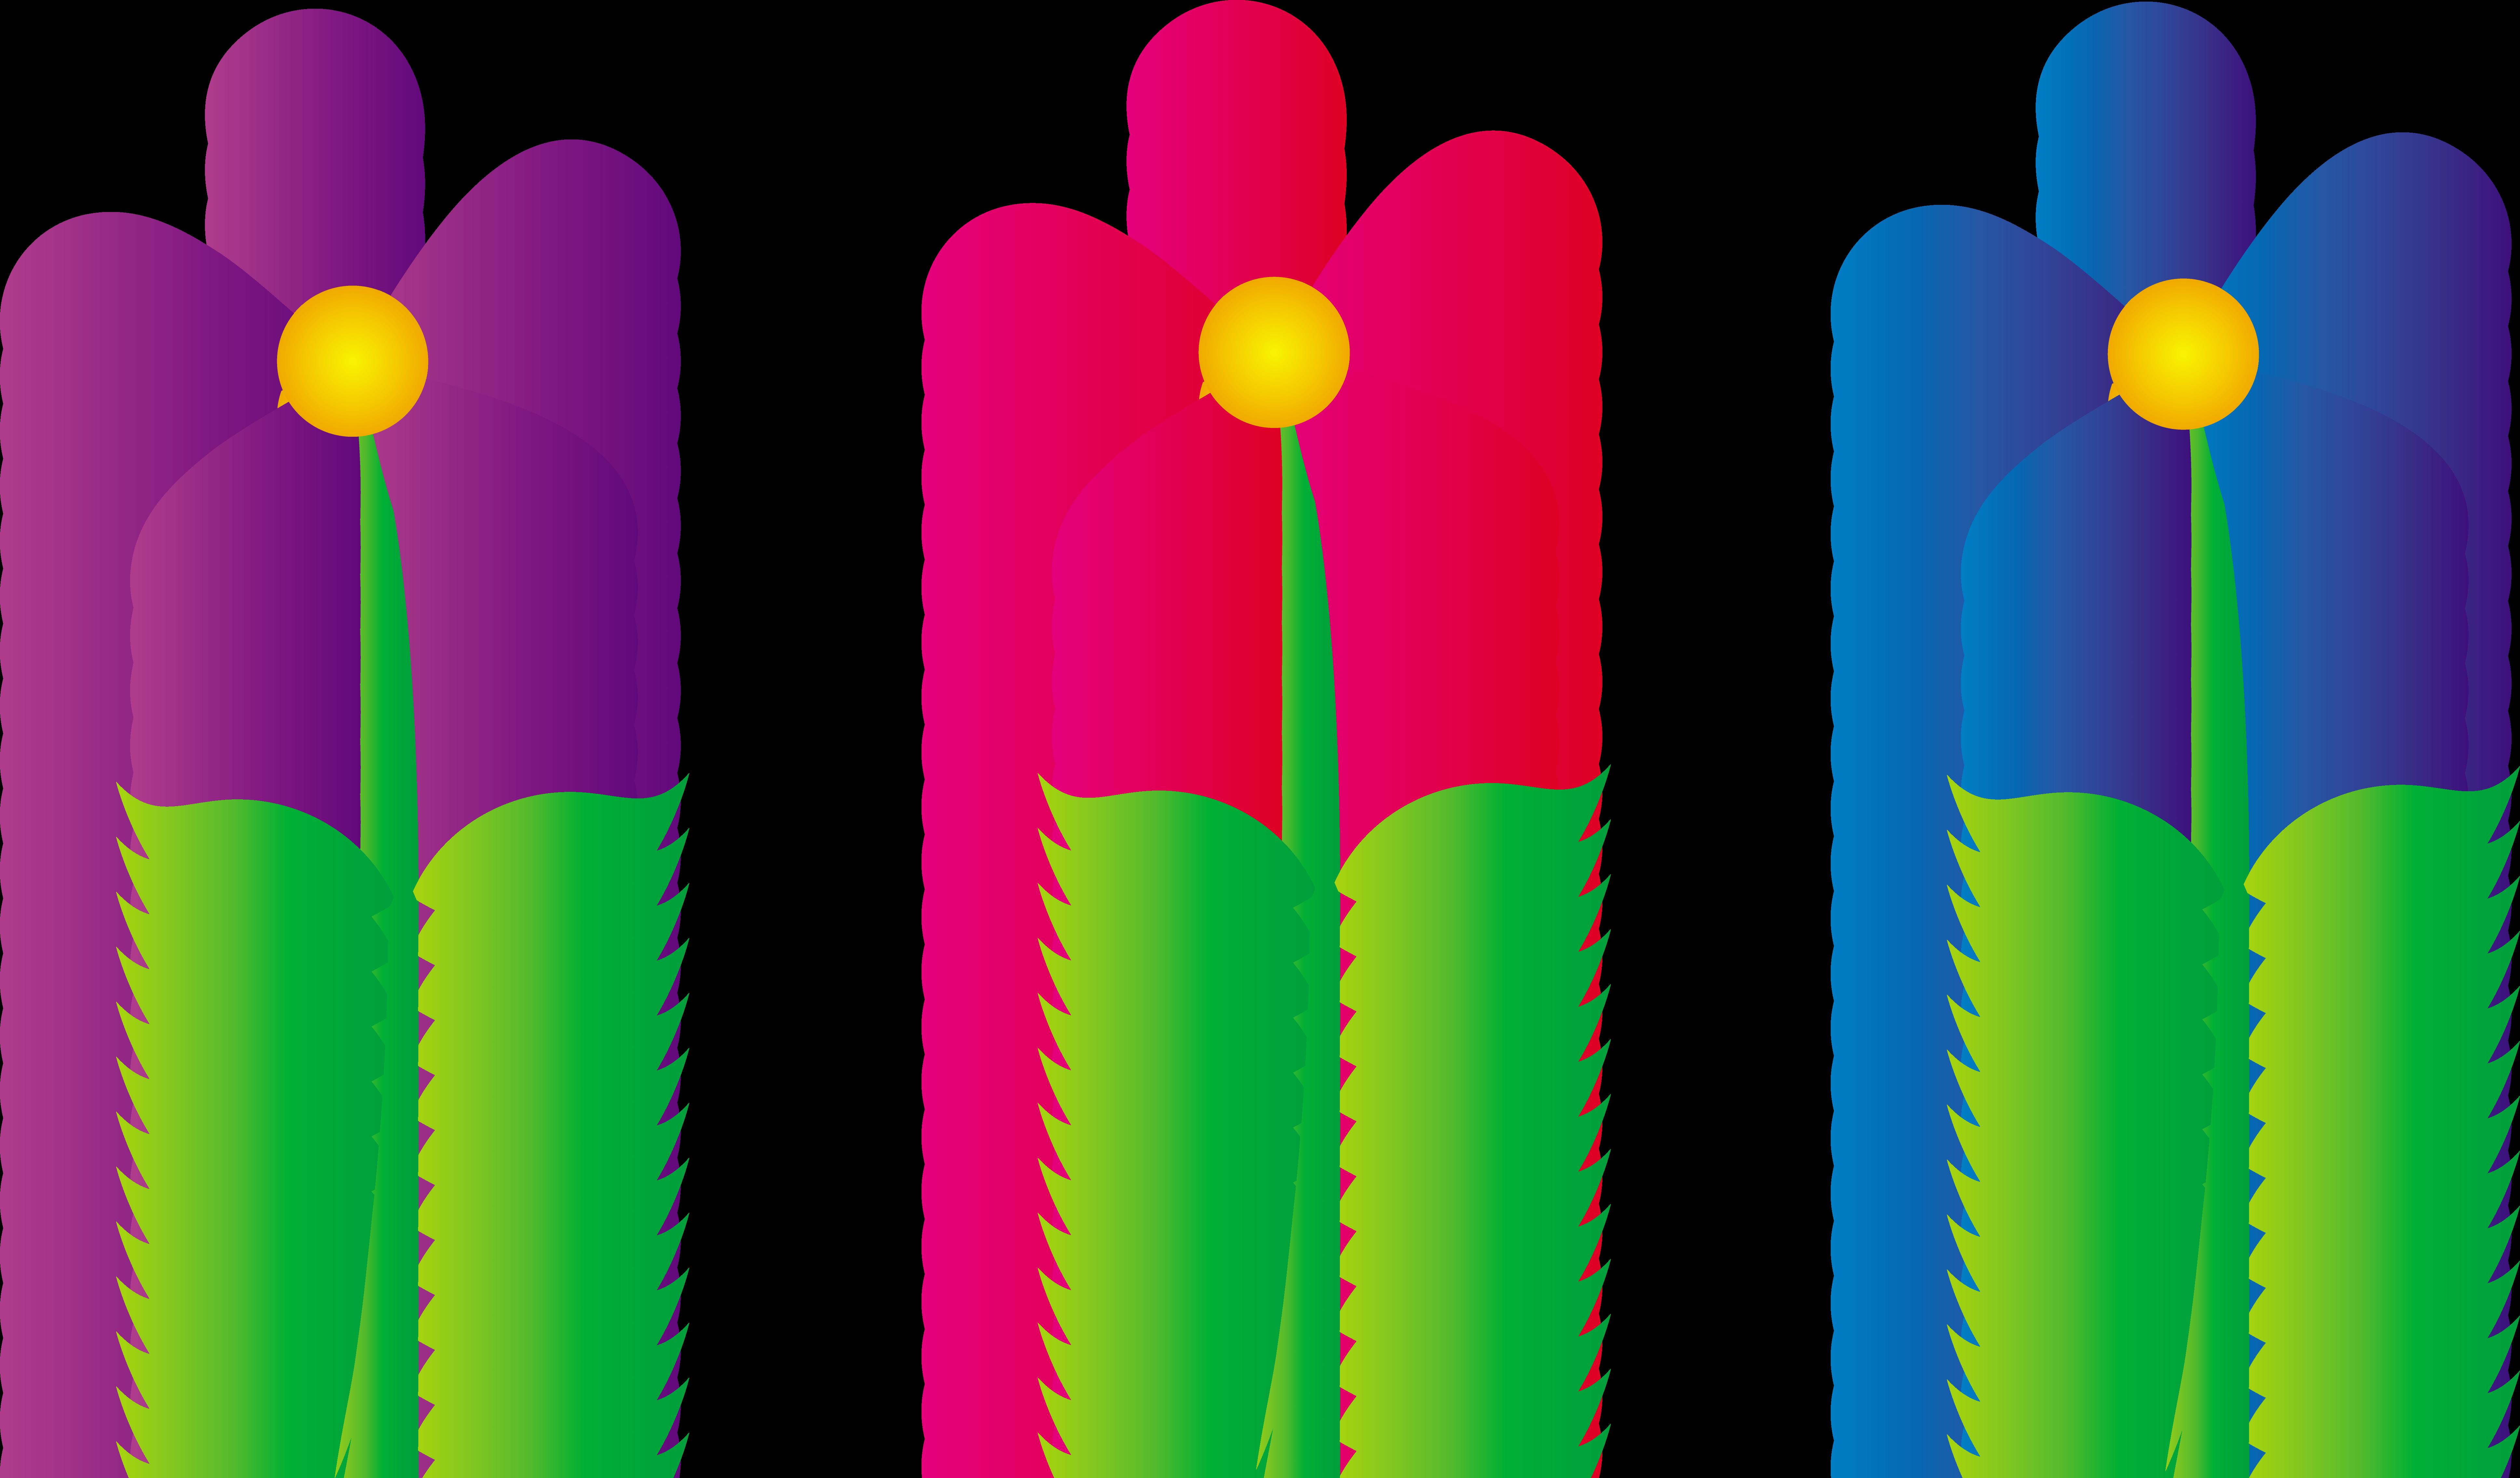 Spring flowers clipart clipart kid - 1be4749542651c3ebb1206ec82a511da_flower20border20clipart Free Clip Art Spring_7747 4545